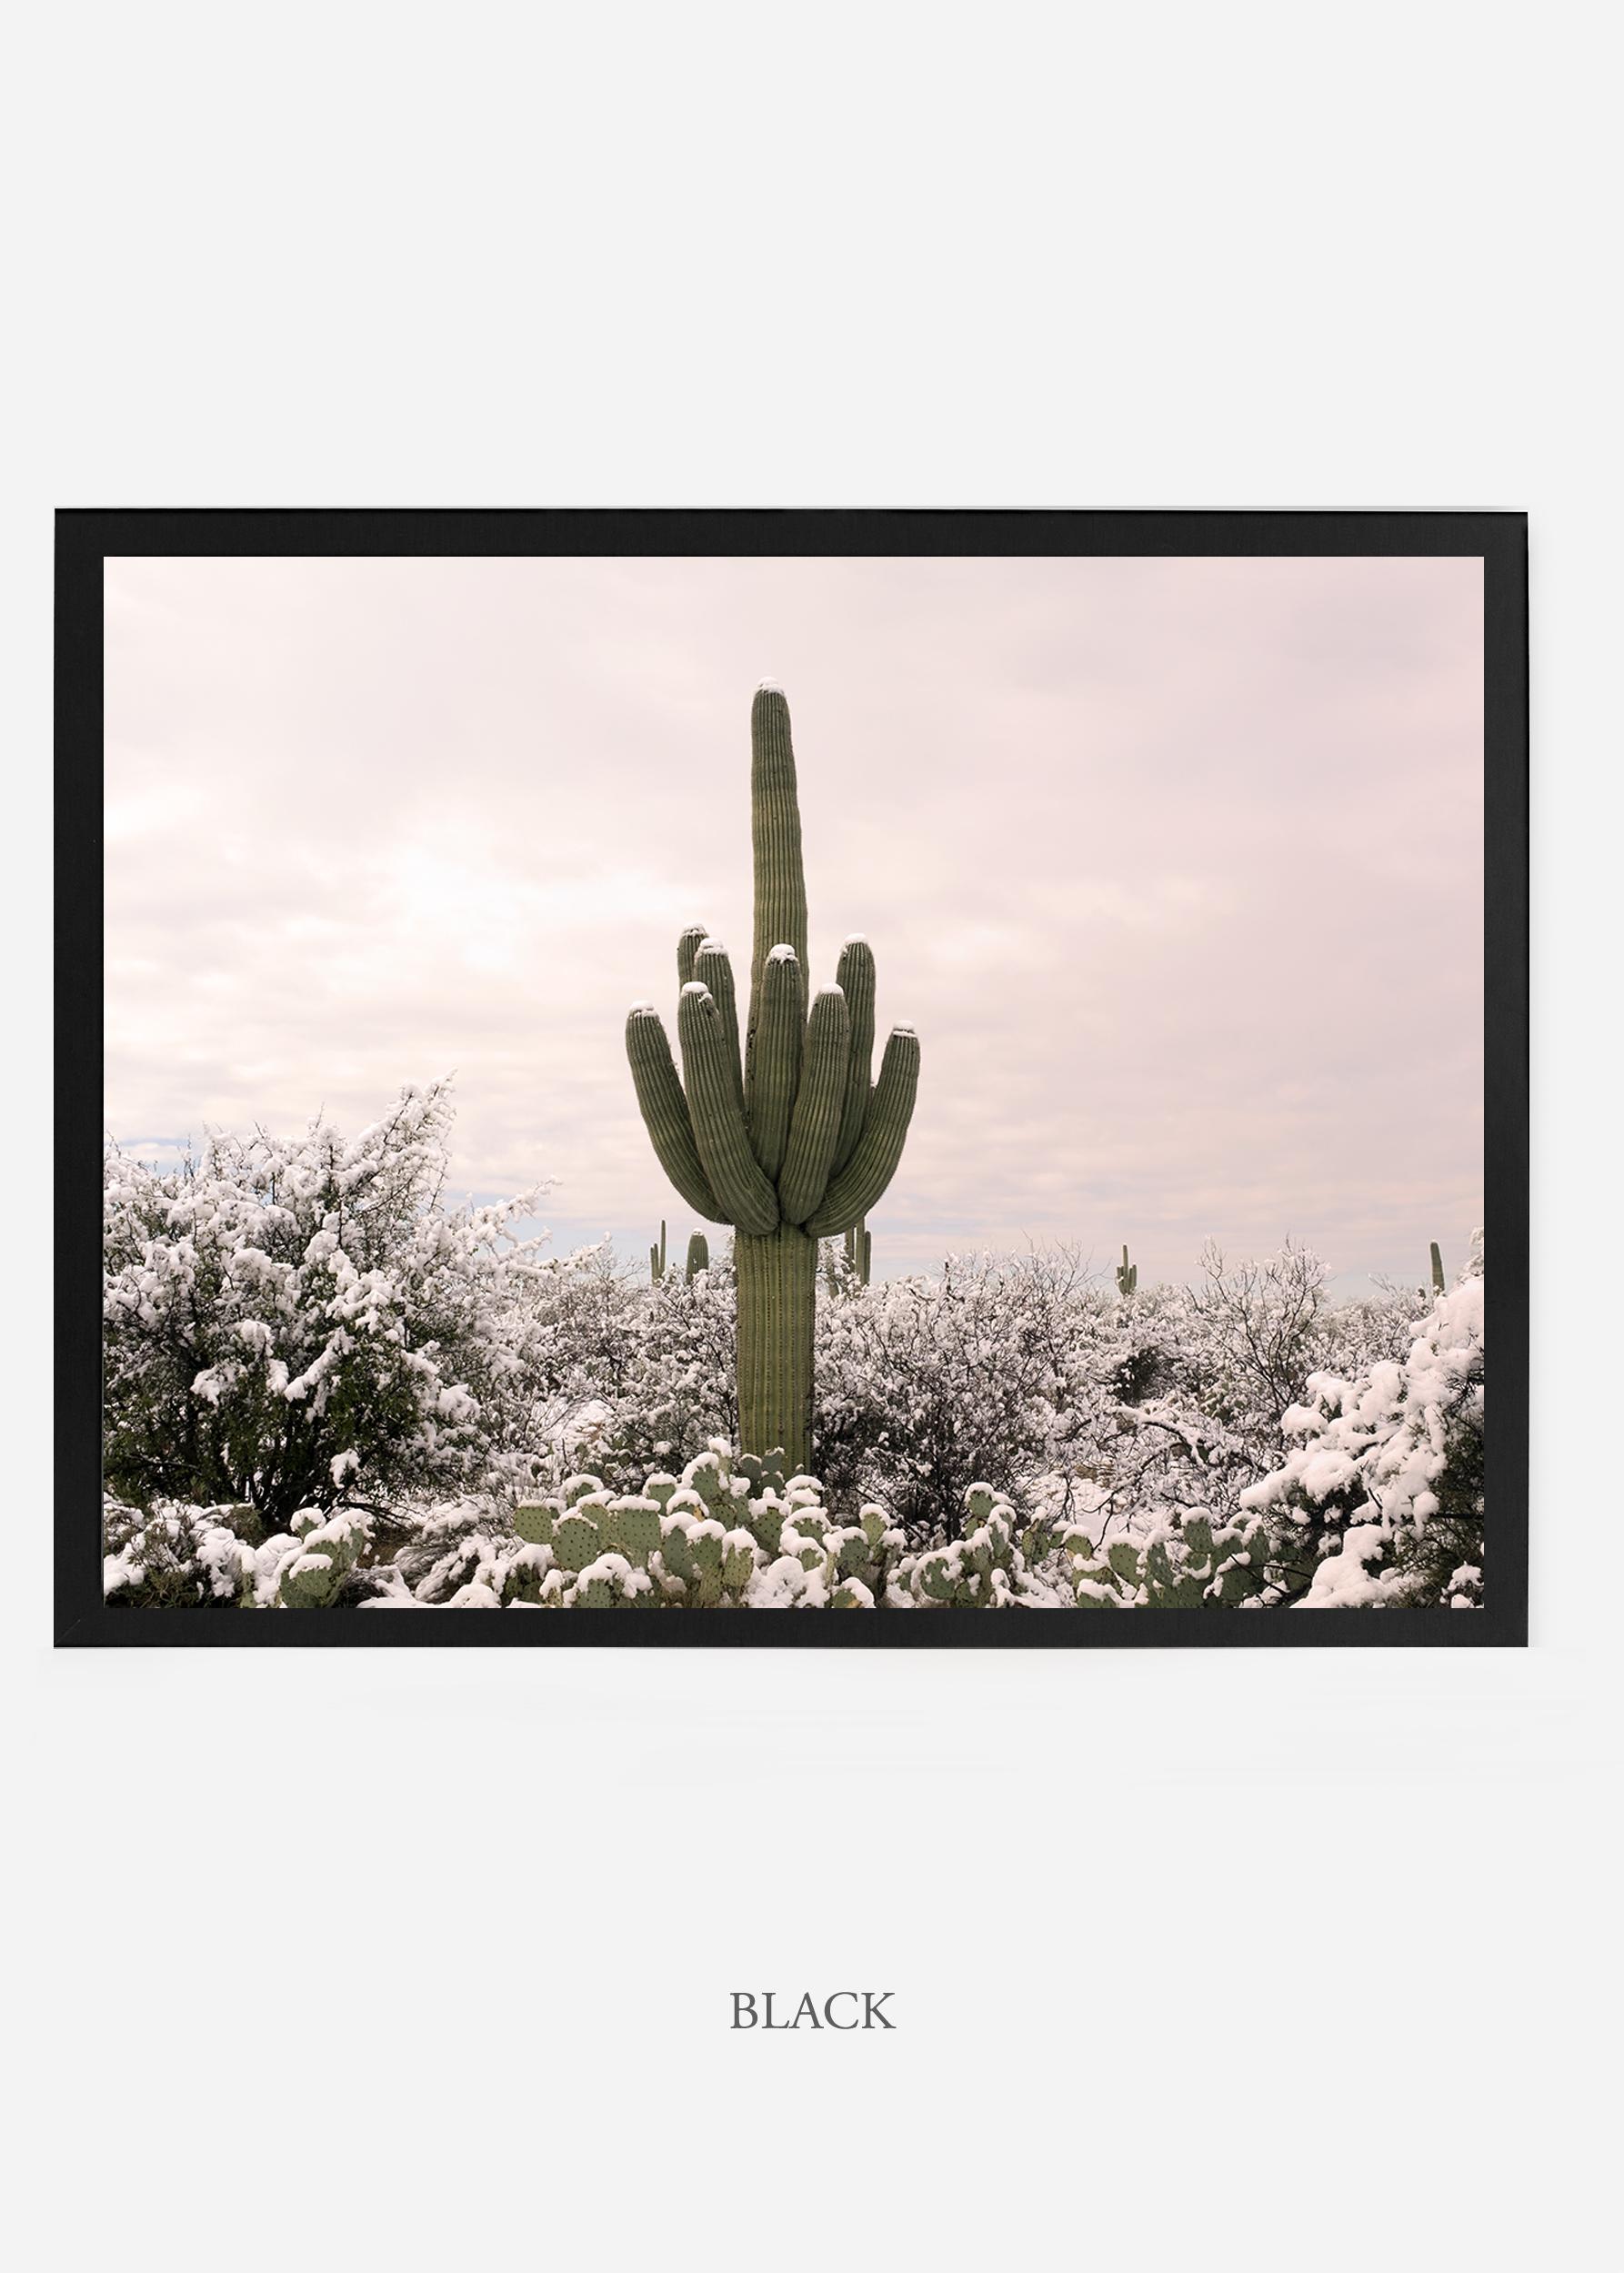 nomat_blackframe-saguaroNo.3-wildercalifornia-art-wallart-cactusprint-homedecor-prints-arizona-botanical-artwork-interiordesign.jpg